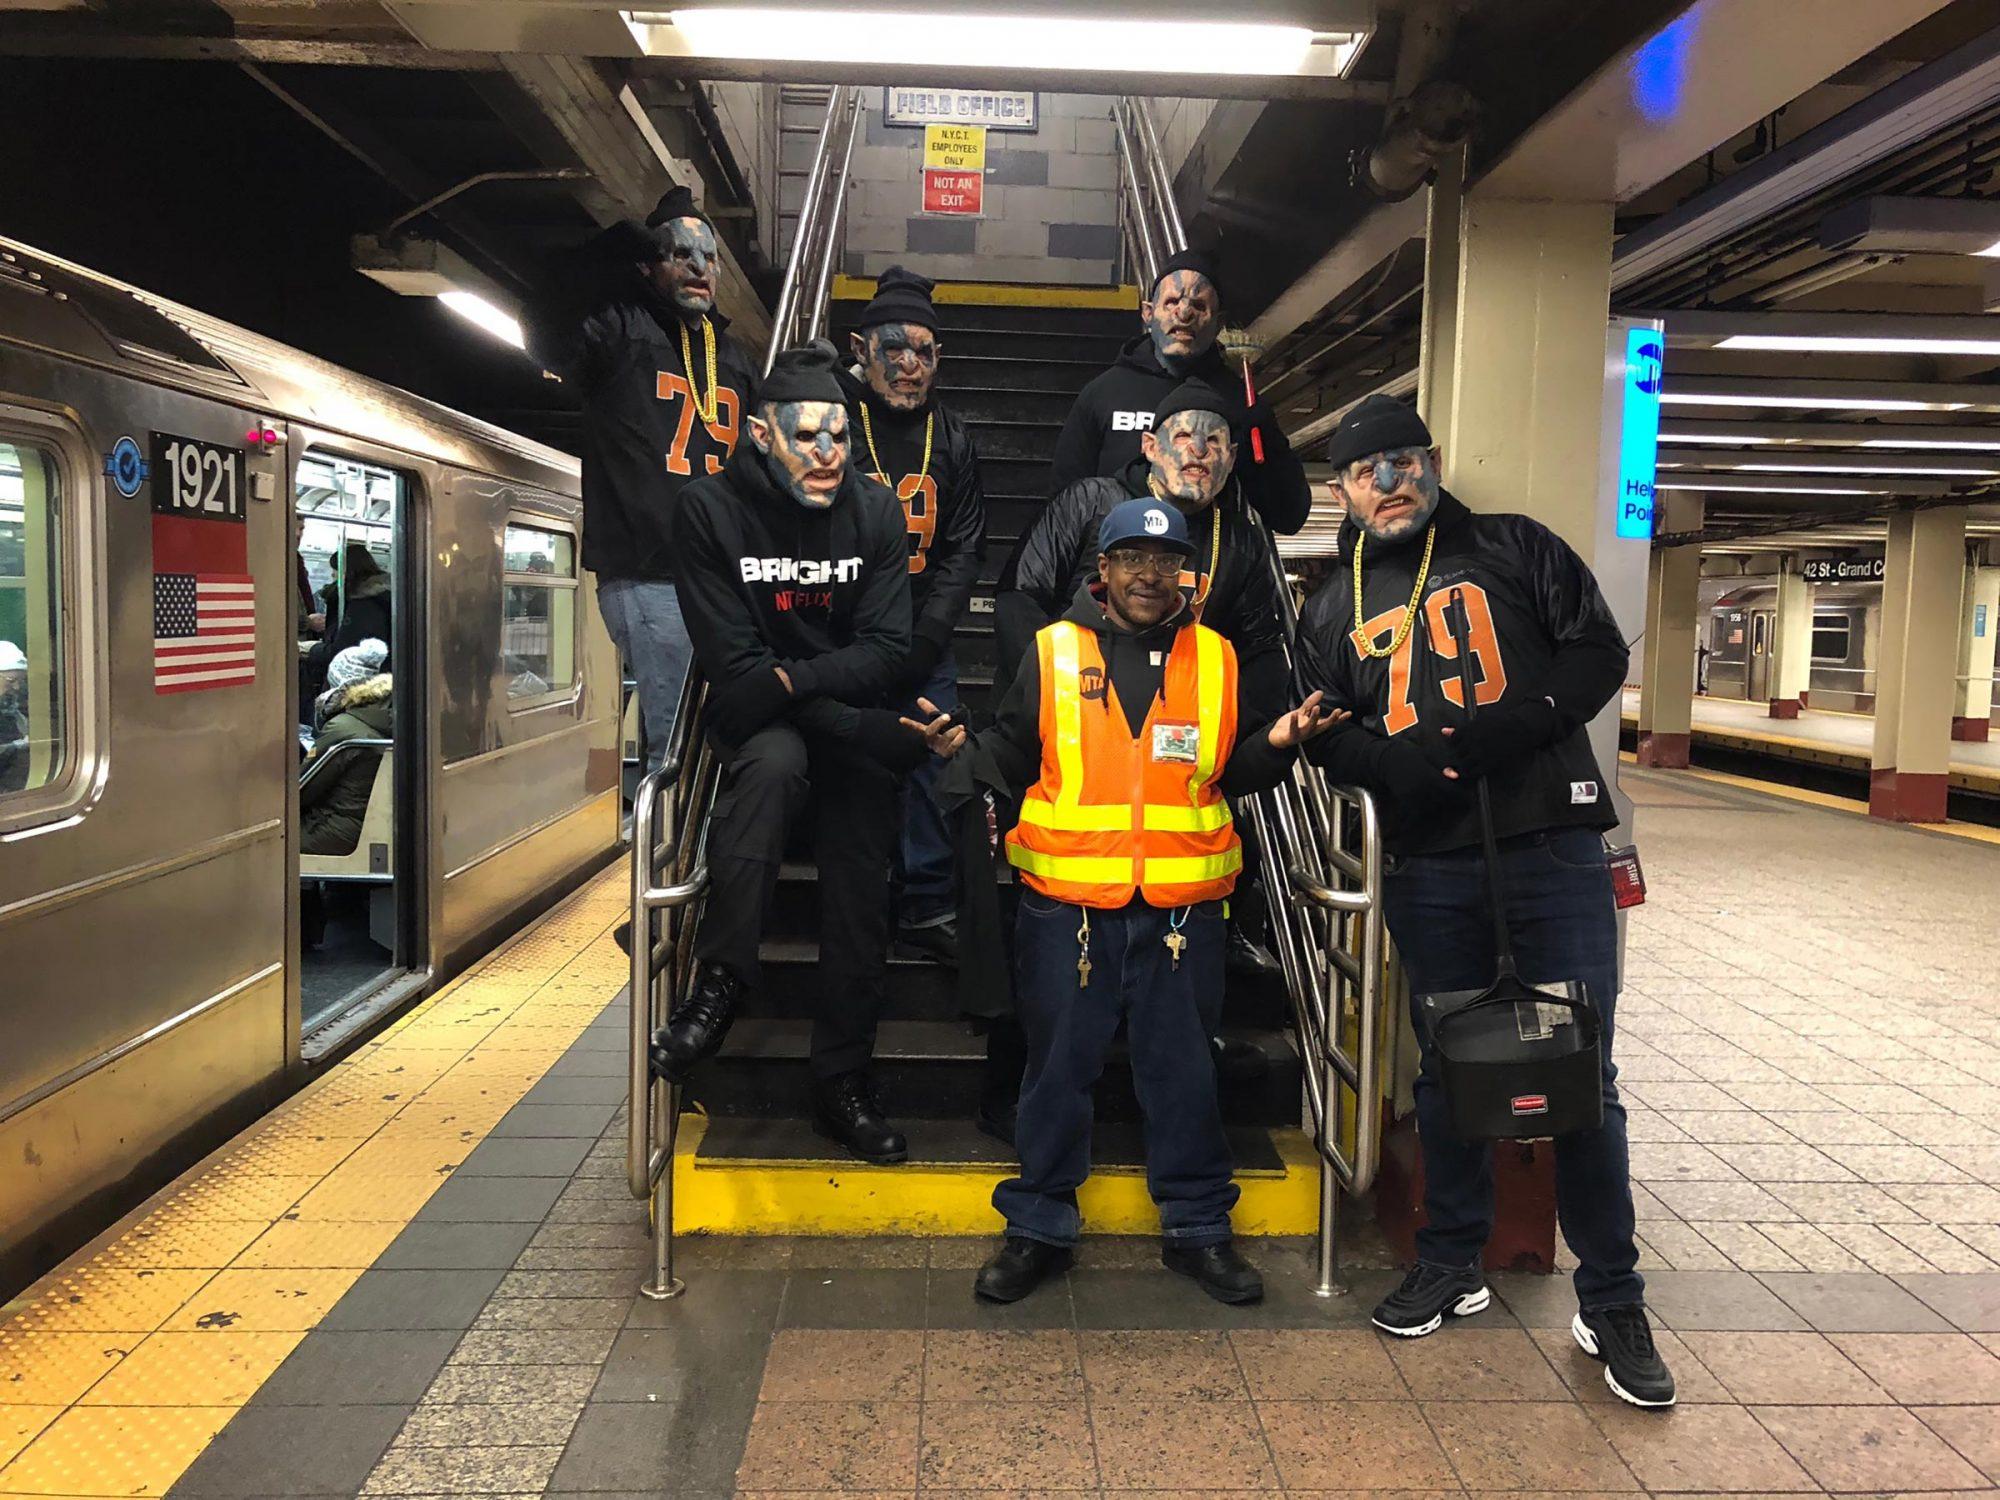 Bright Orcs walking around New York City on 12/15/17 CR: TBA